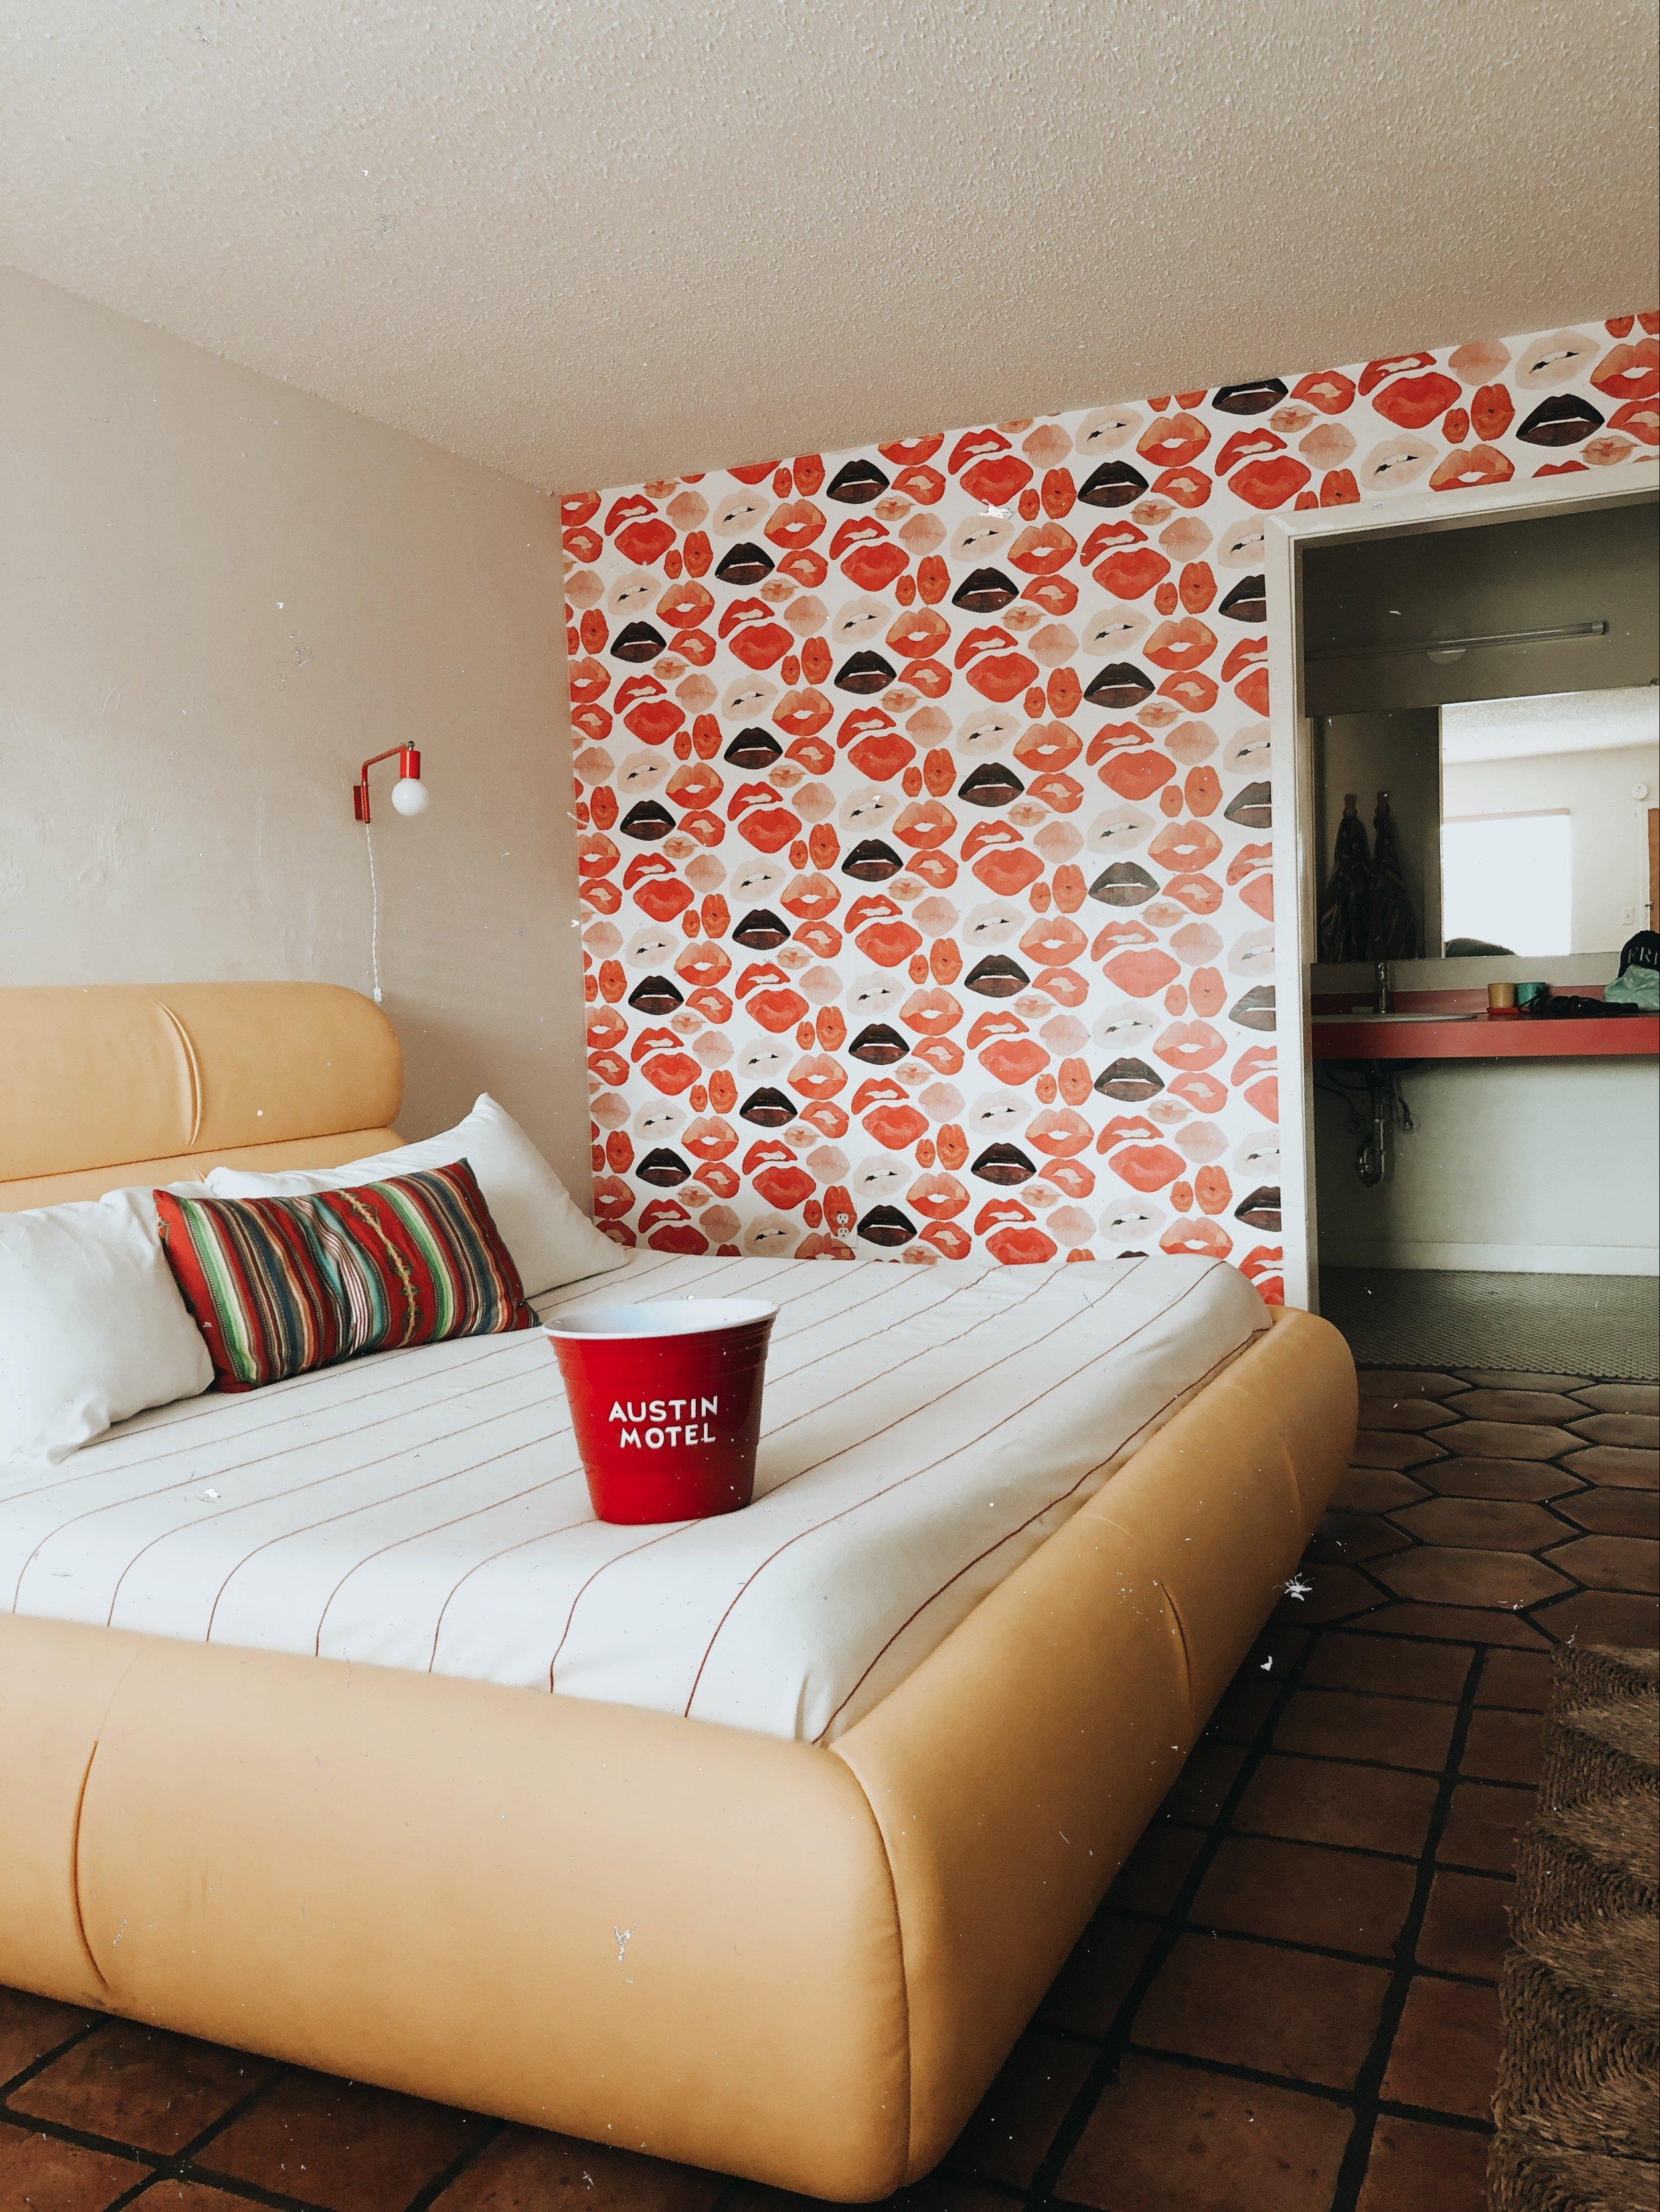 austin-motel.JPG